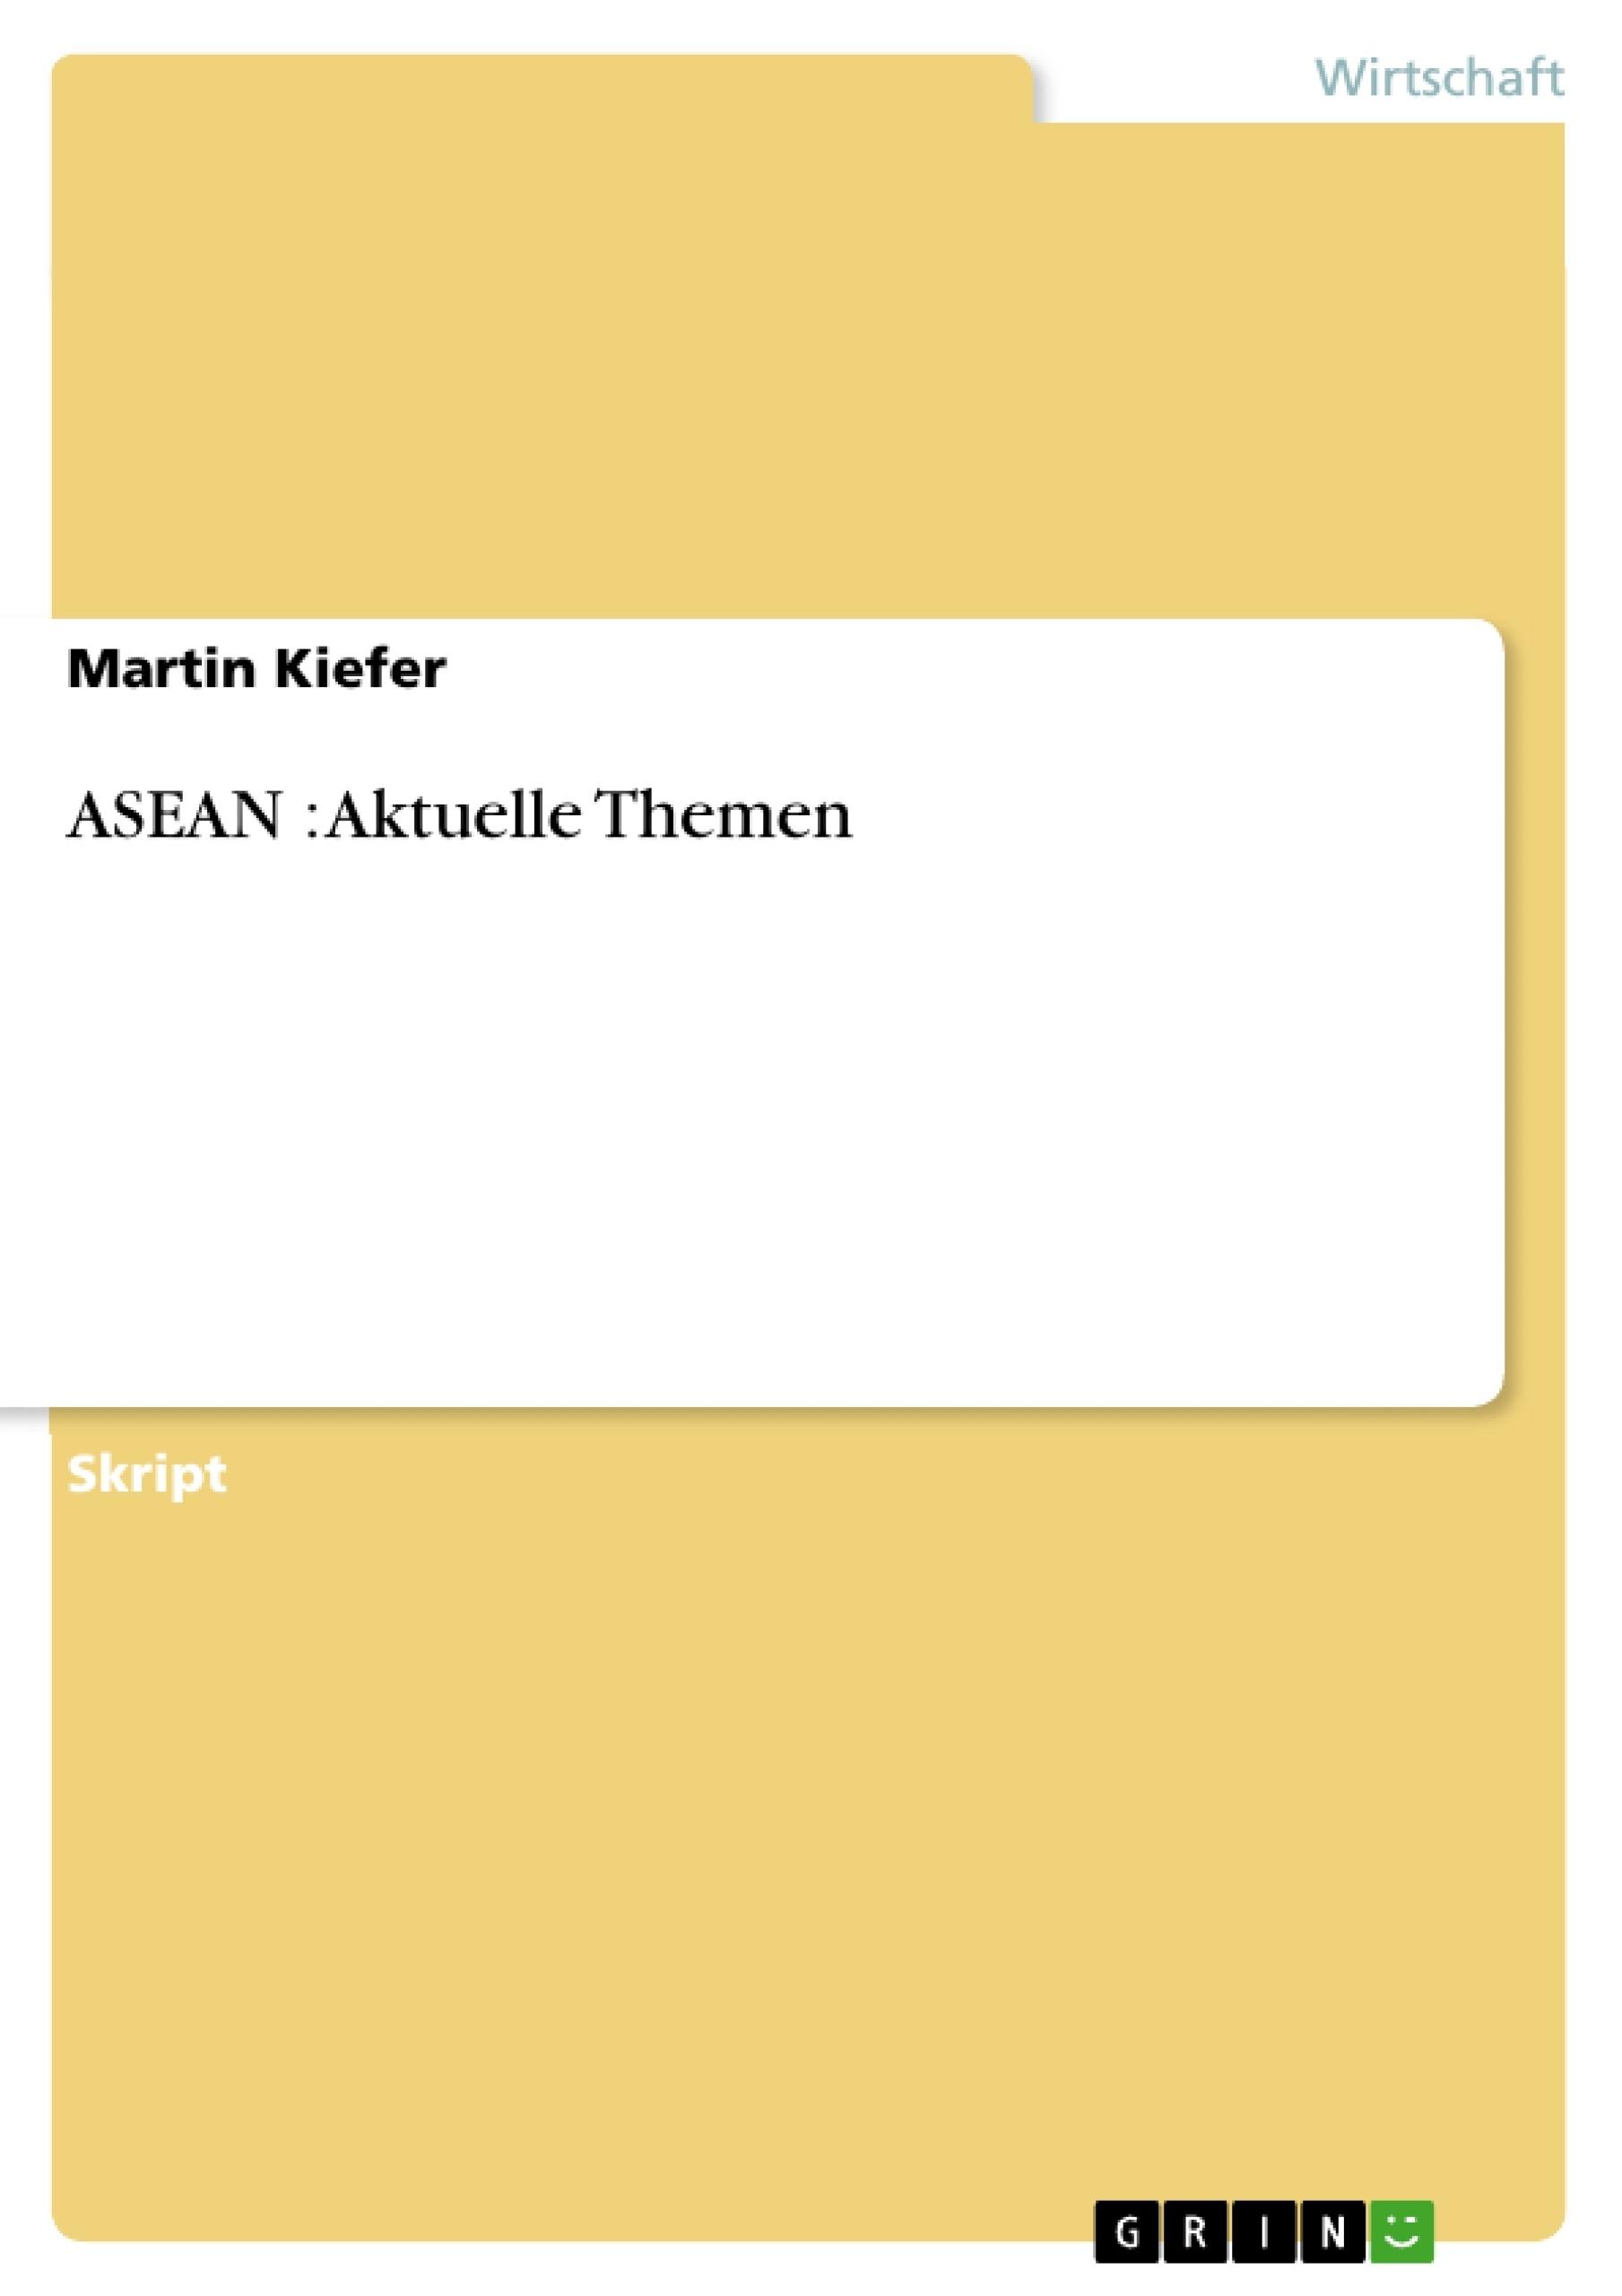 Titel: ASEAN : Aktuelle Themen